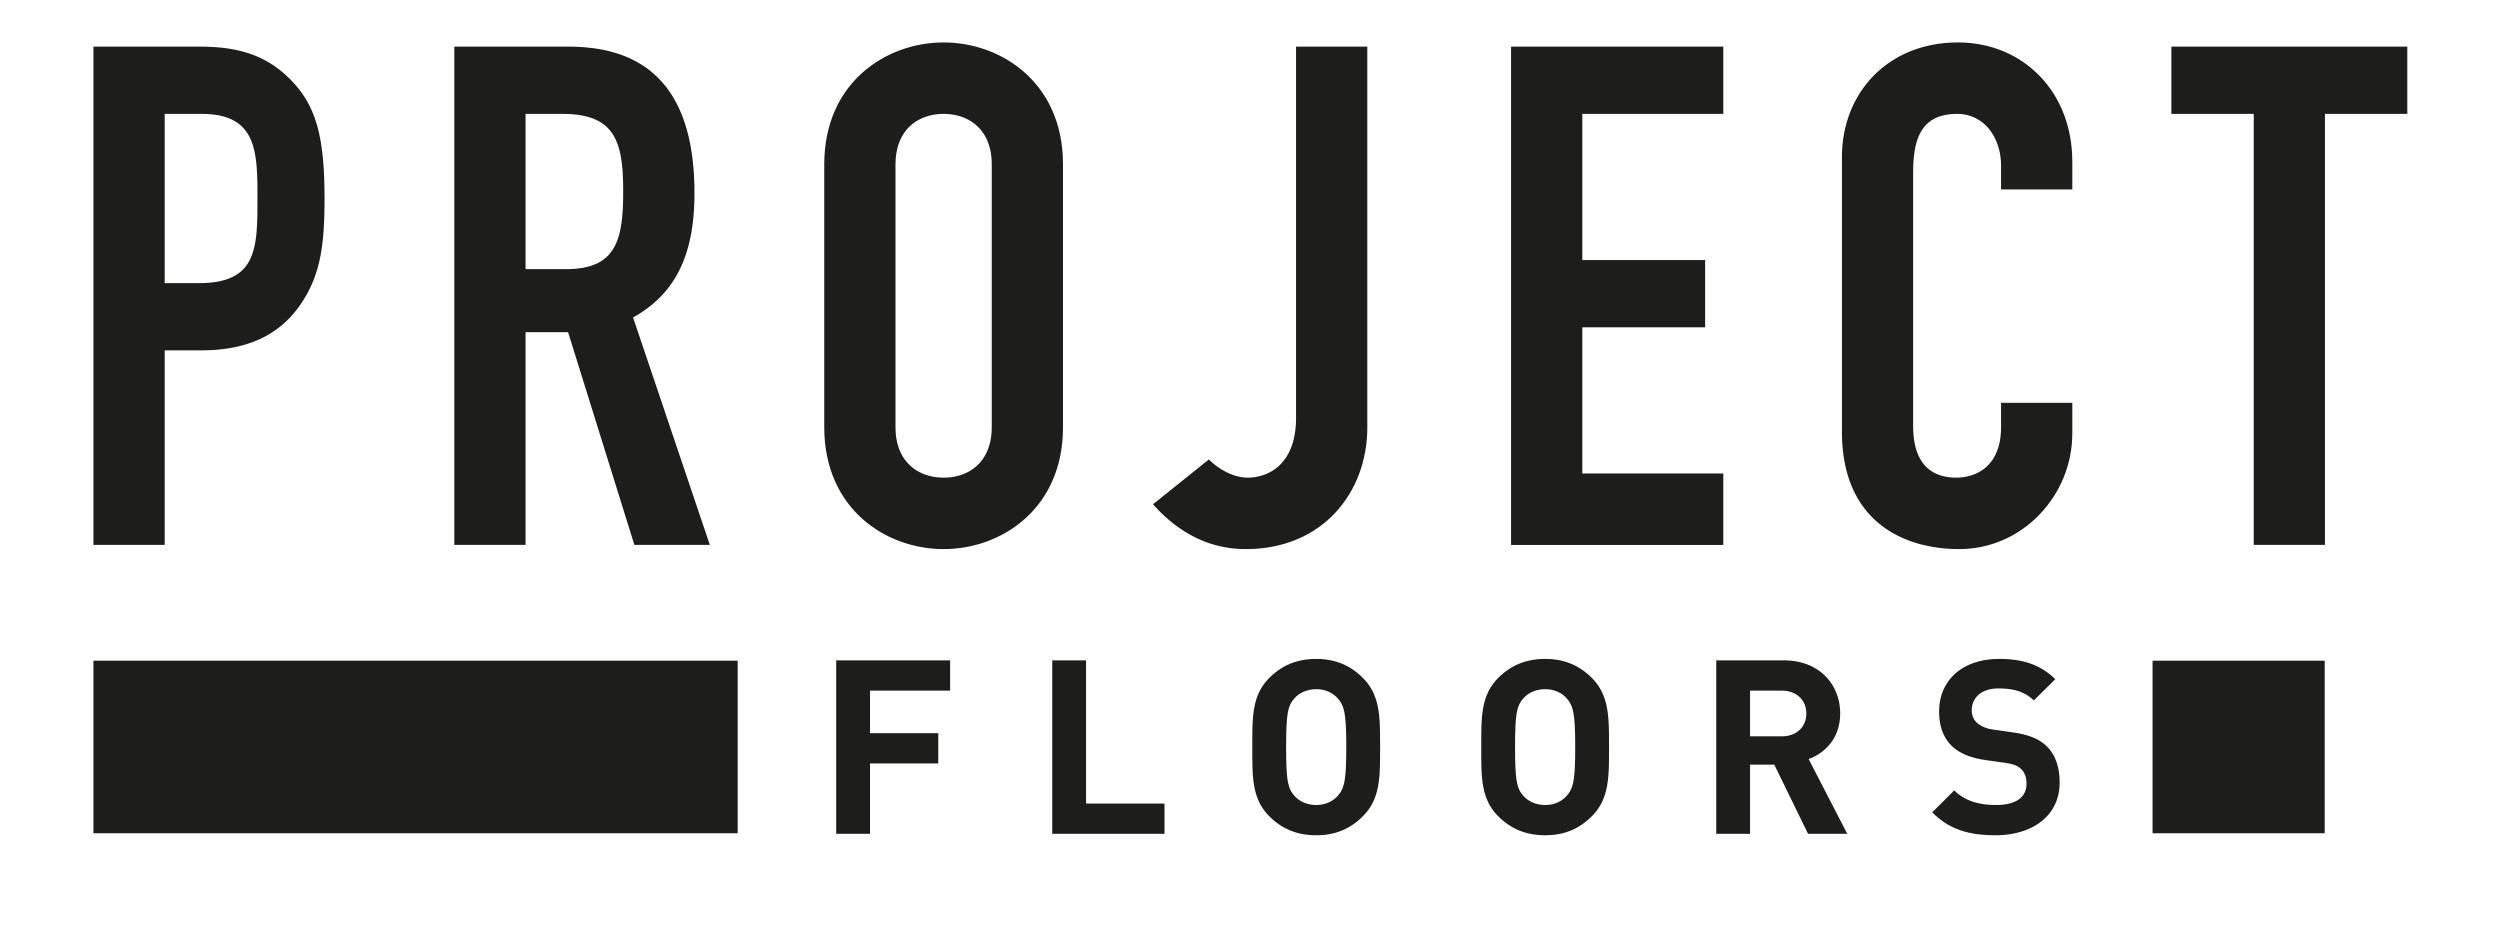 project-floors-logo.png